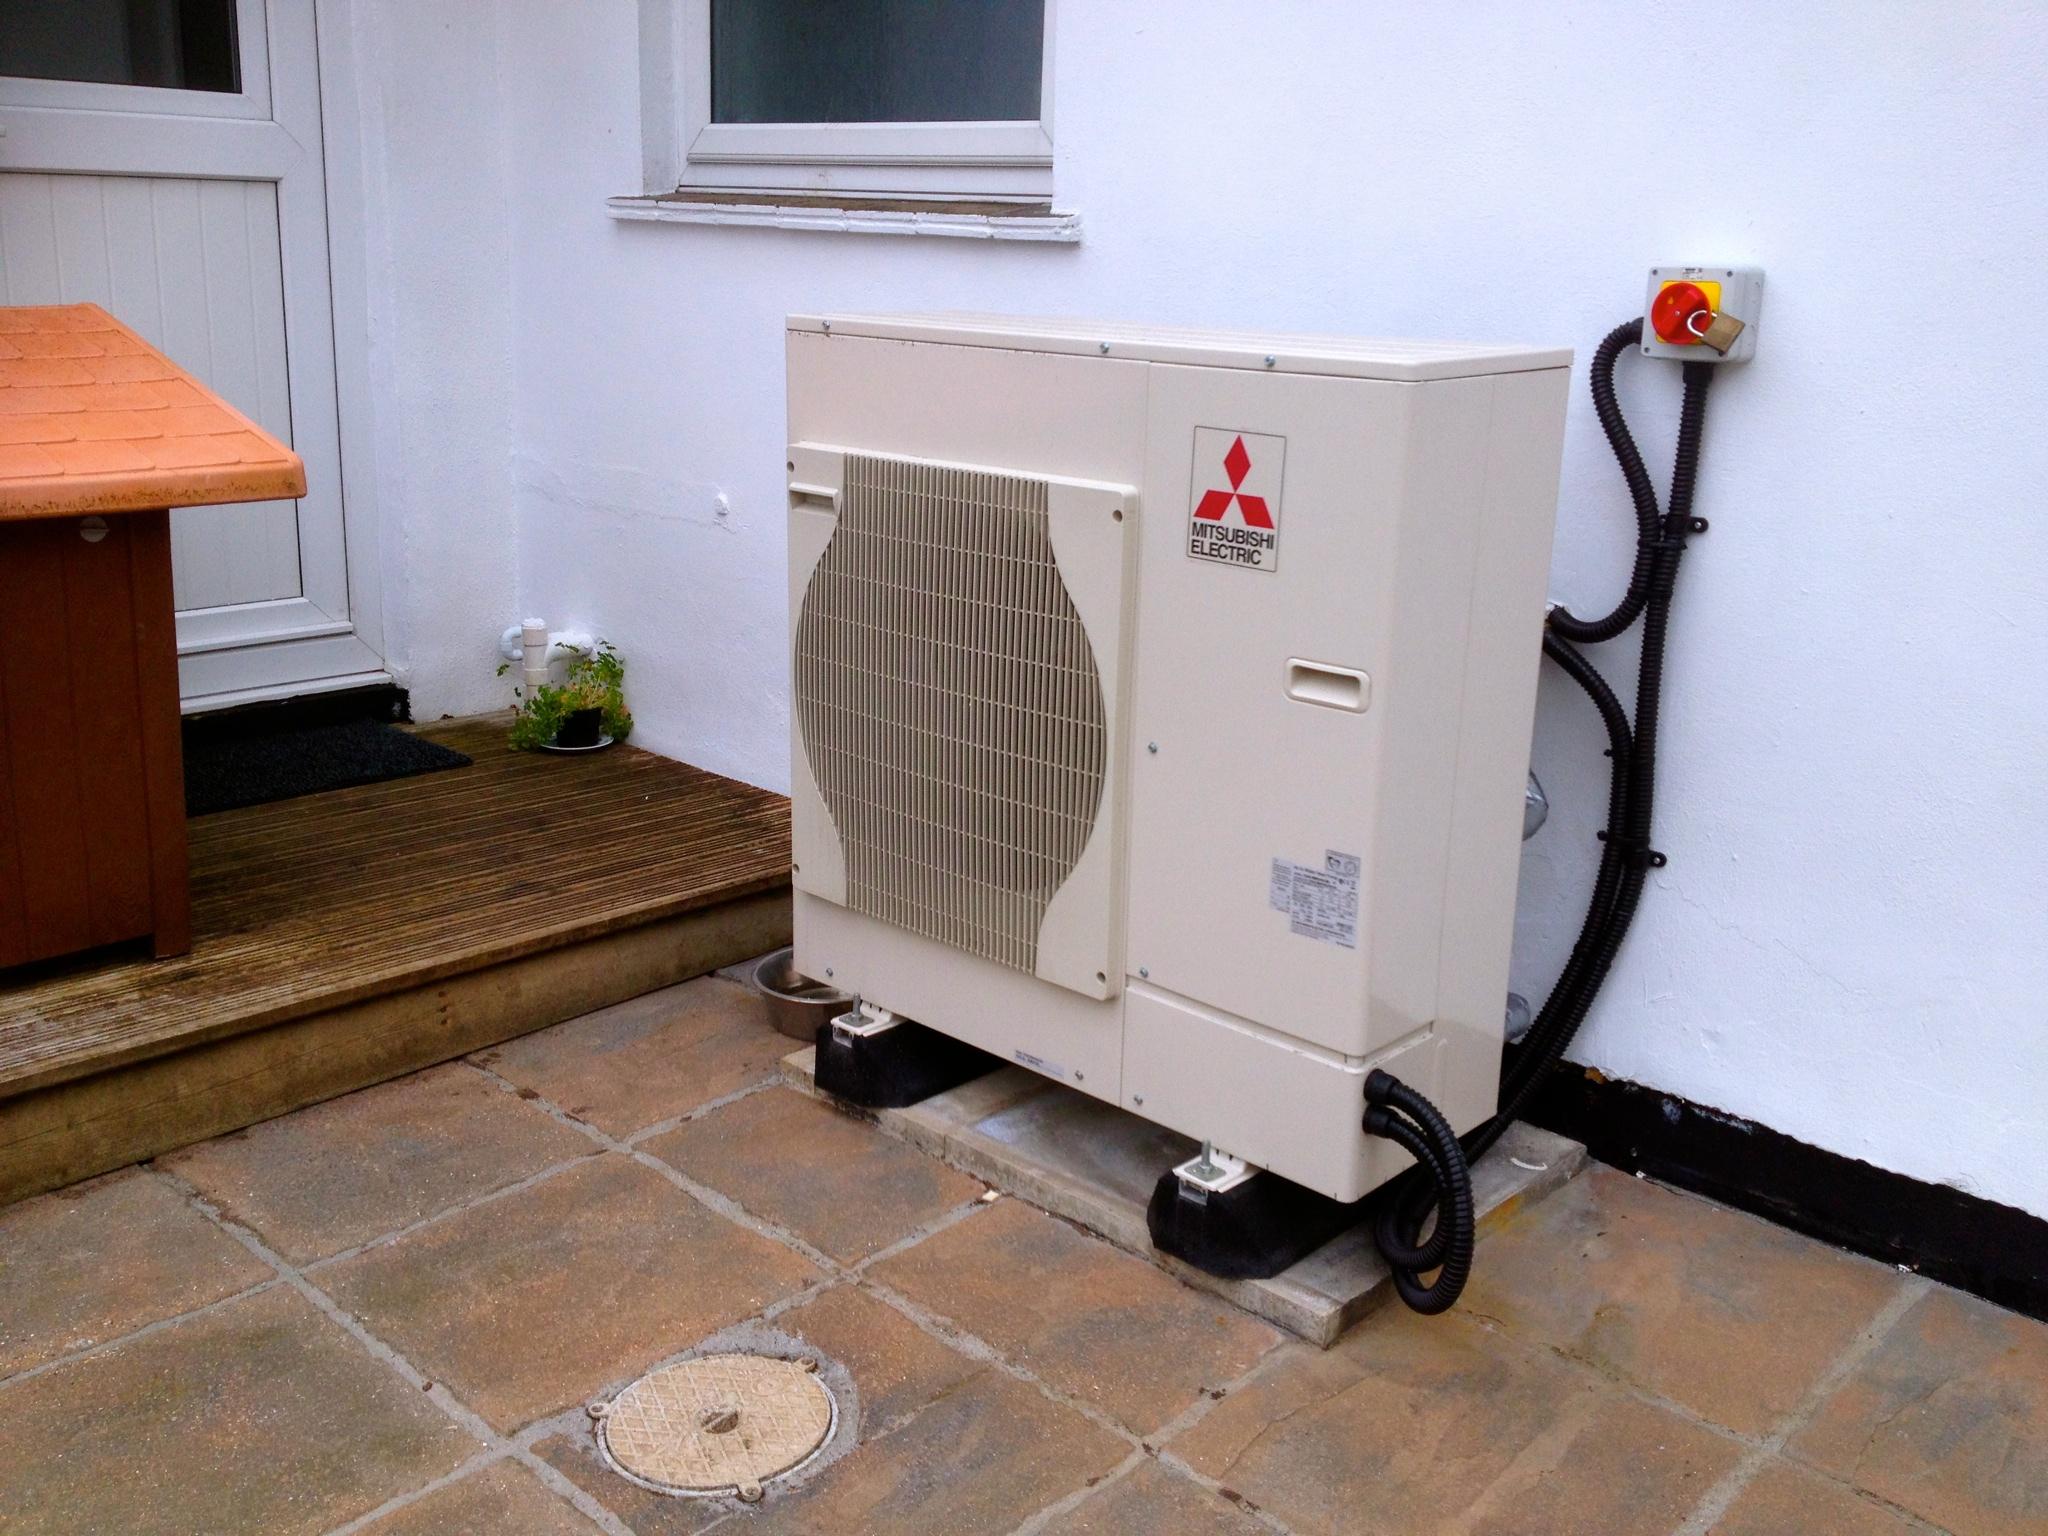 How To Install A Heat Pump Air Source Heat Pump Install The Lizard Cornwall Greengenuk